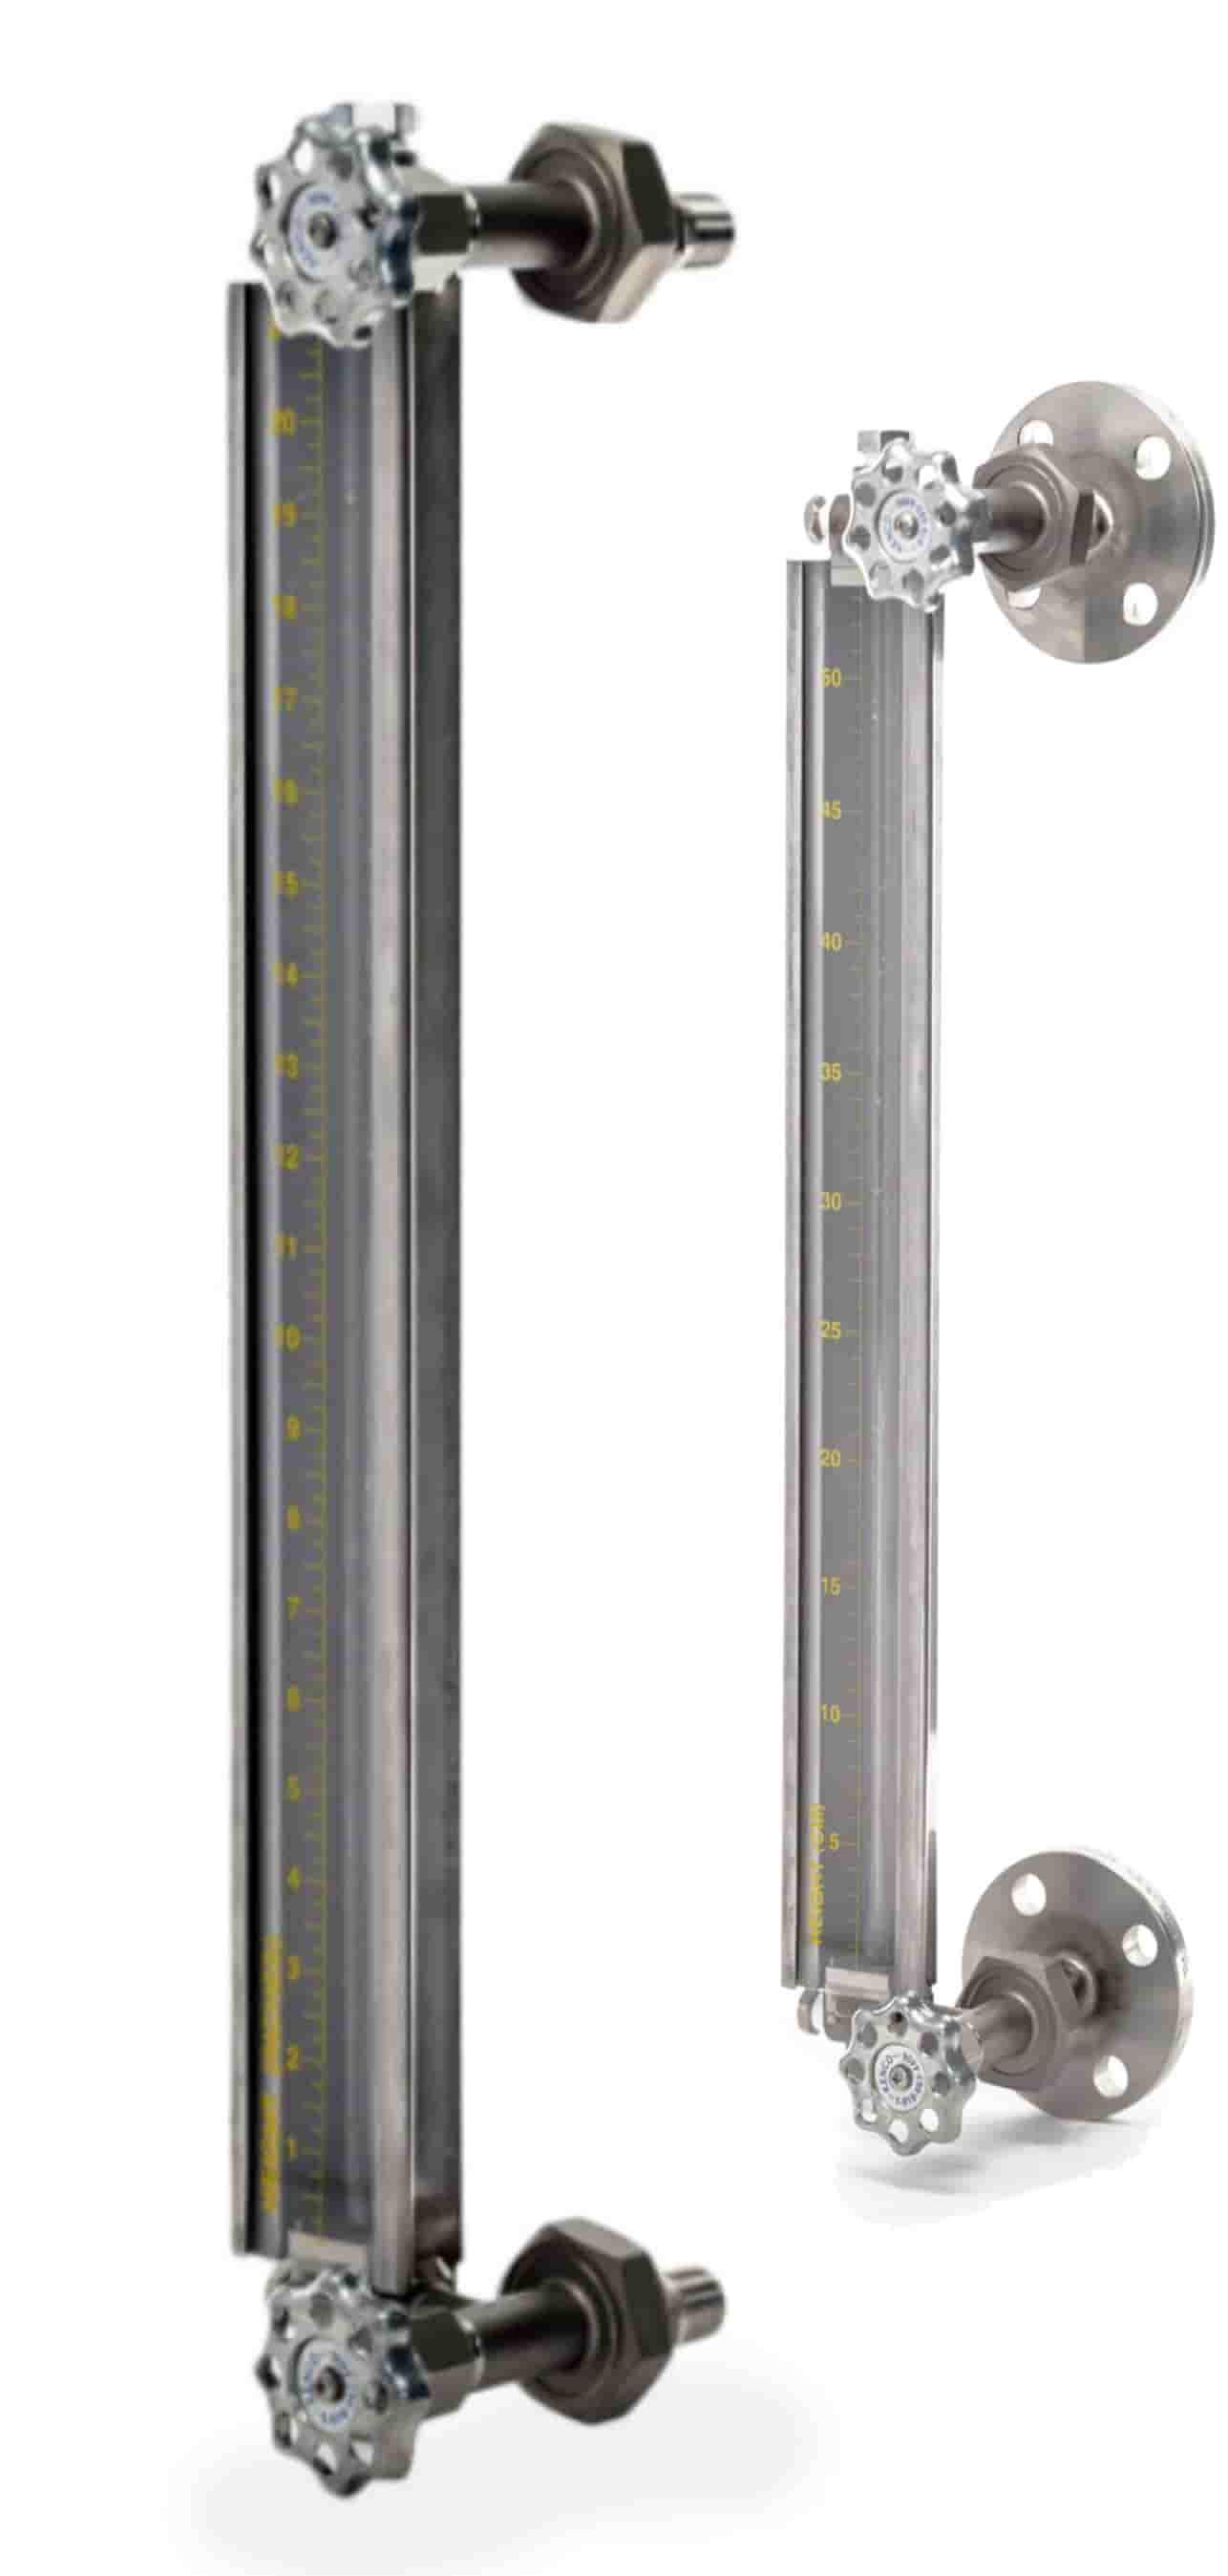 Kenco K9900 Tubular Liquid Level Gauge Boilersupplies Com